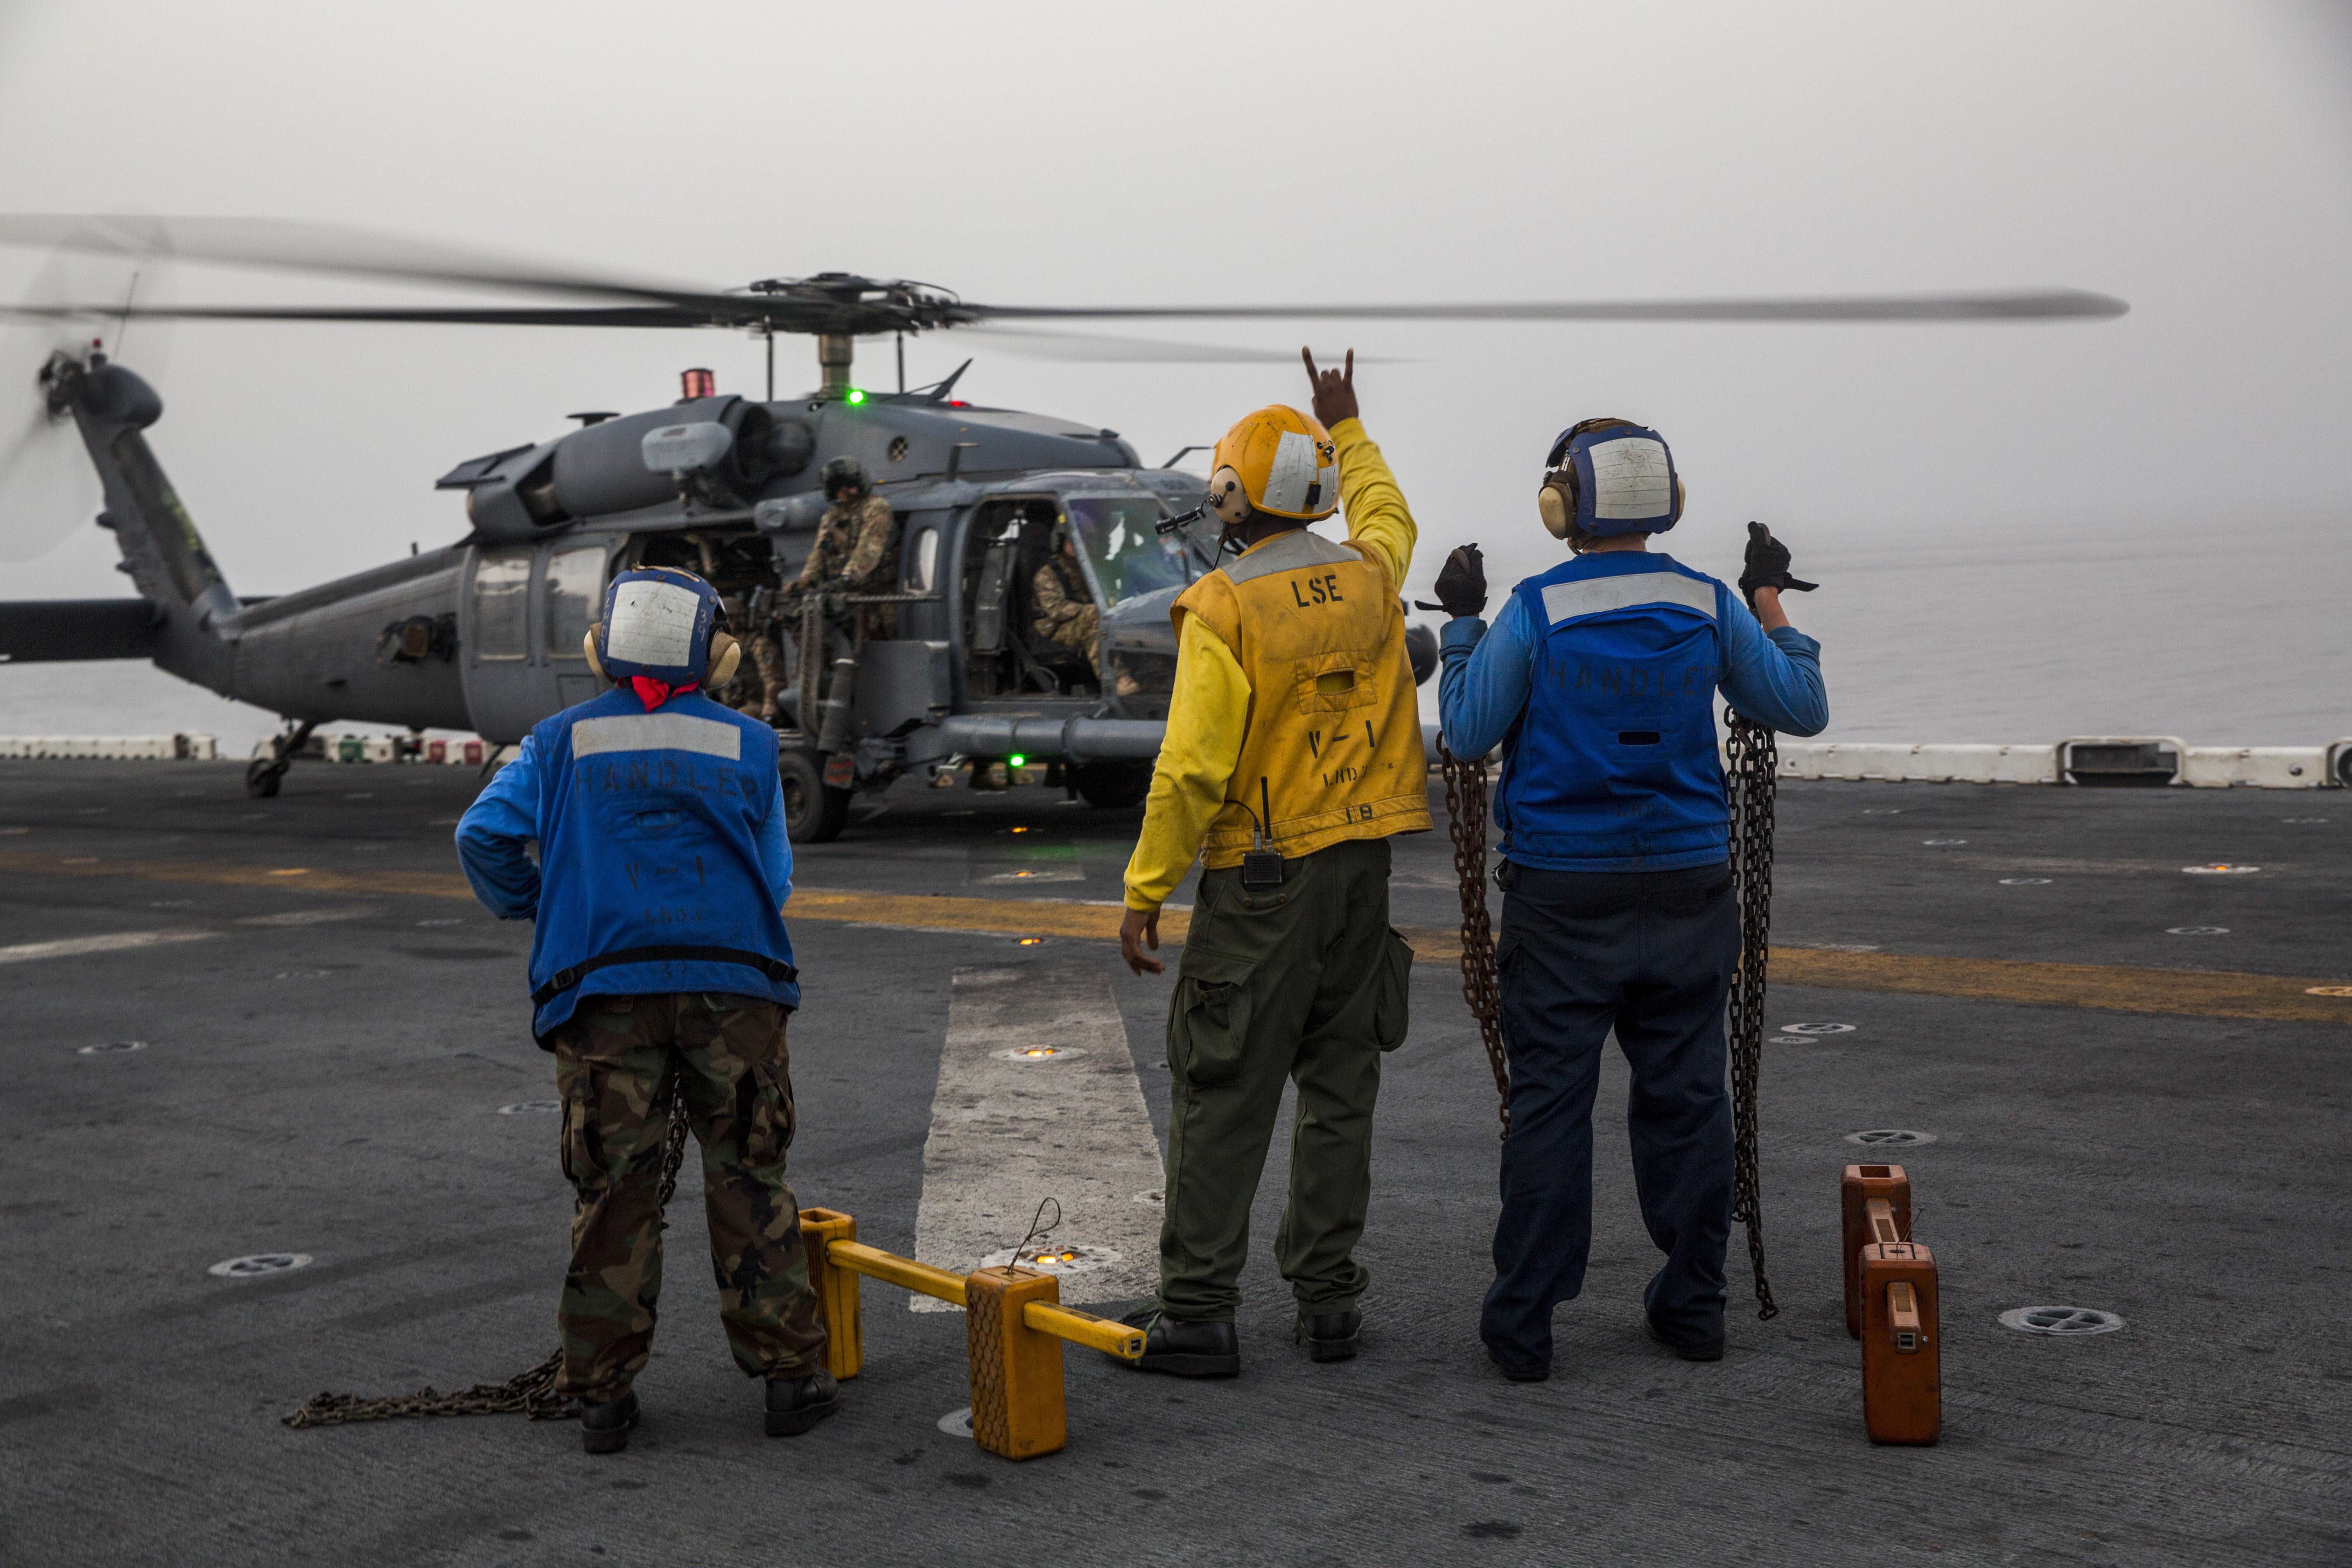 File:A U S  Navy aviation boatswain's mate, in yellow shirt